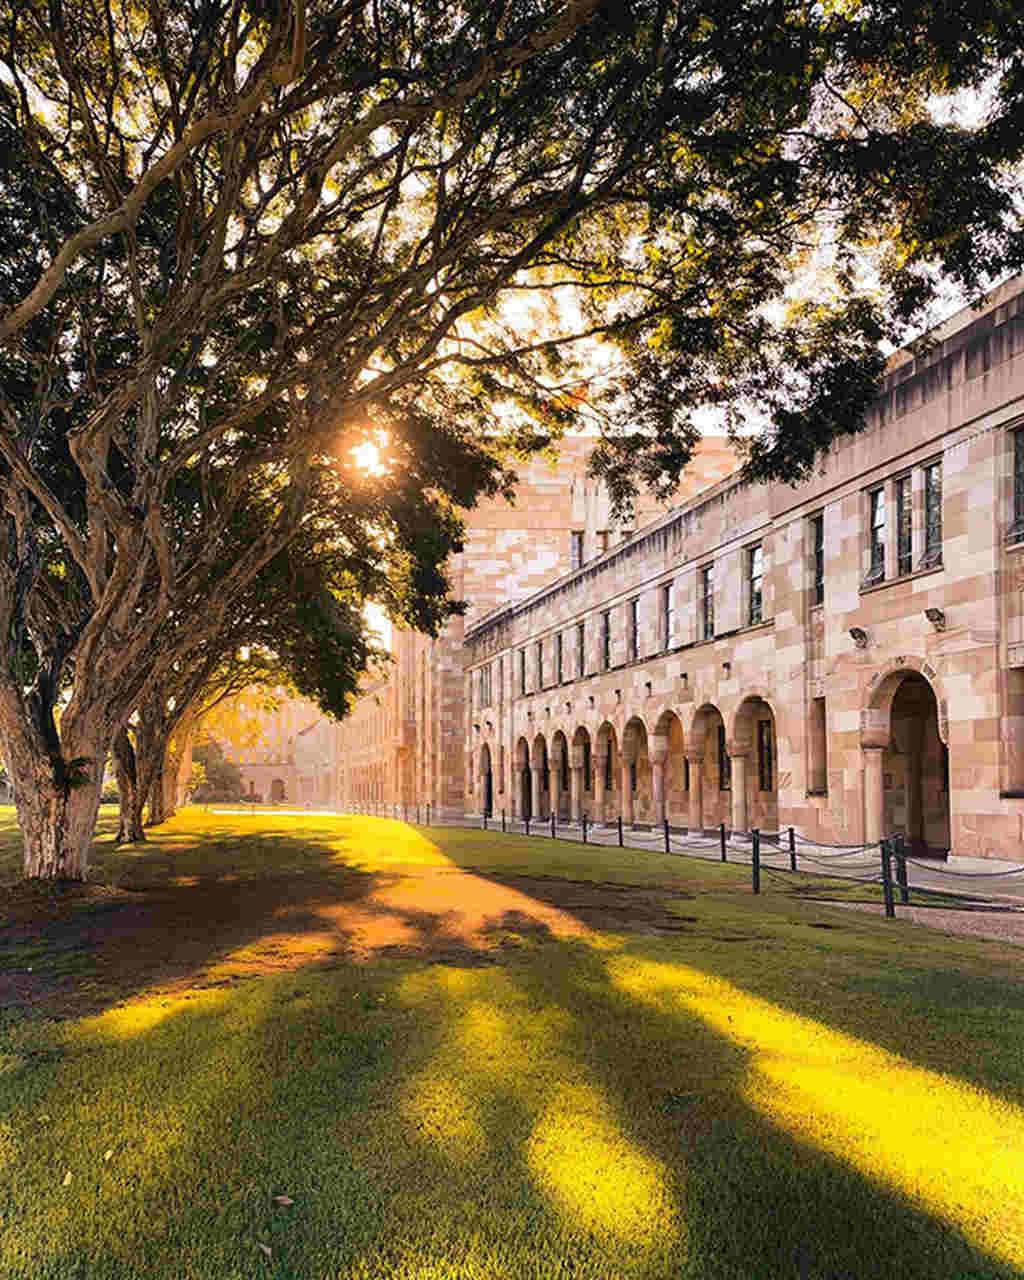 Tree, Architecture, Sky, Light, Yellow, Building, Arch, Sunlight, Grass, Spring, Plant, City, College, Street, The University of Queensland, Bond University, The University of Western Australia, University